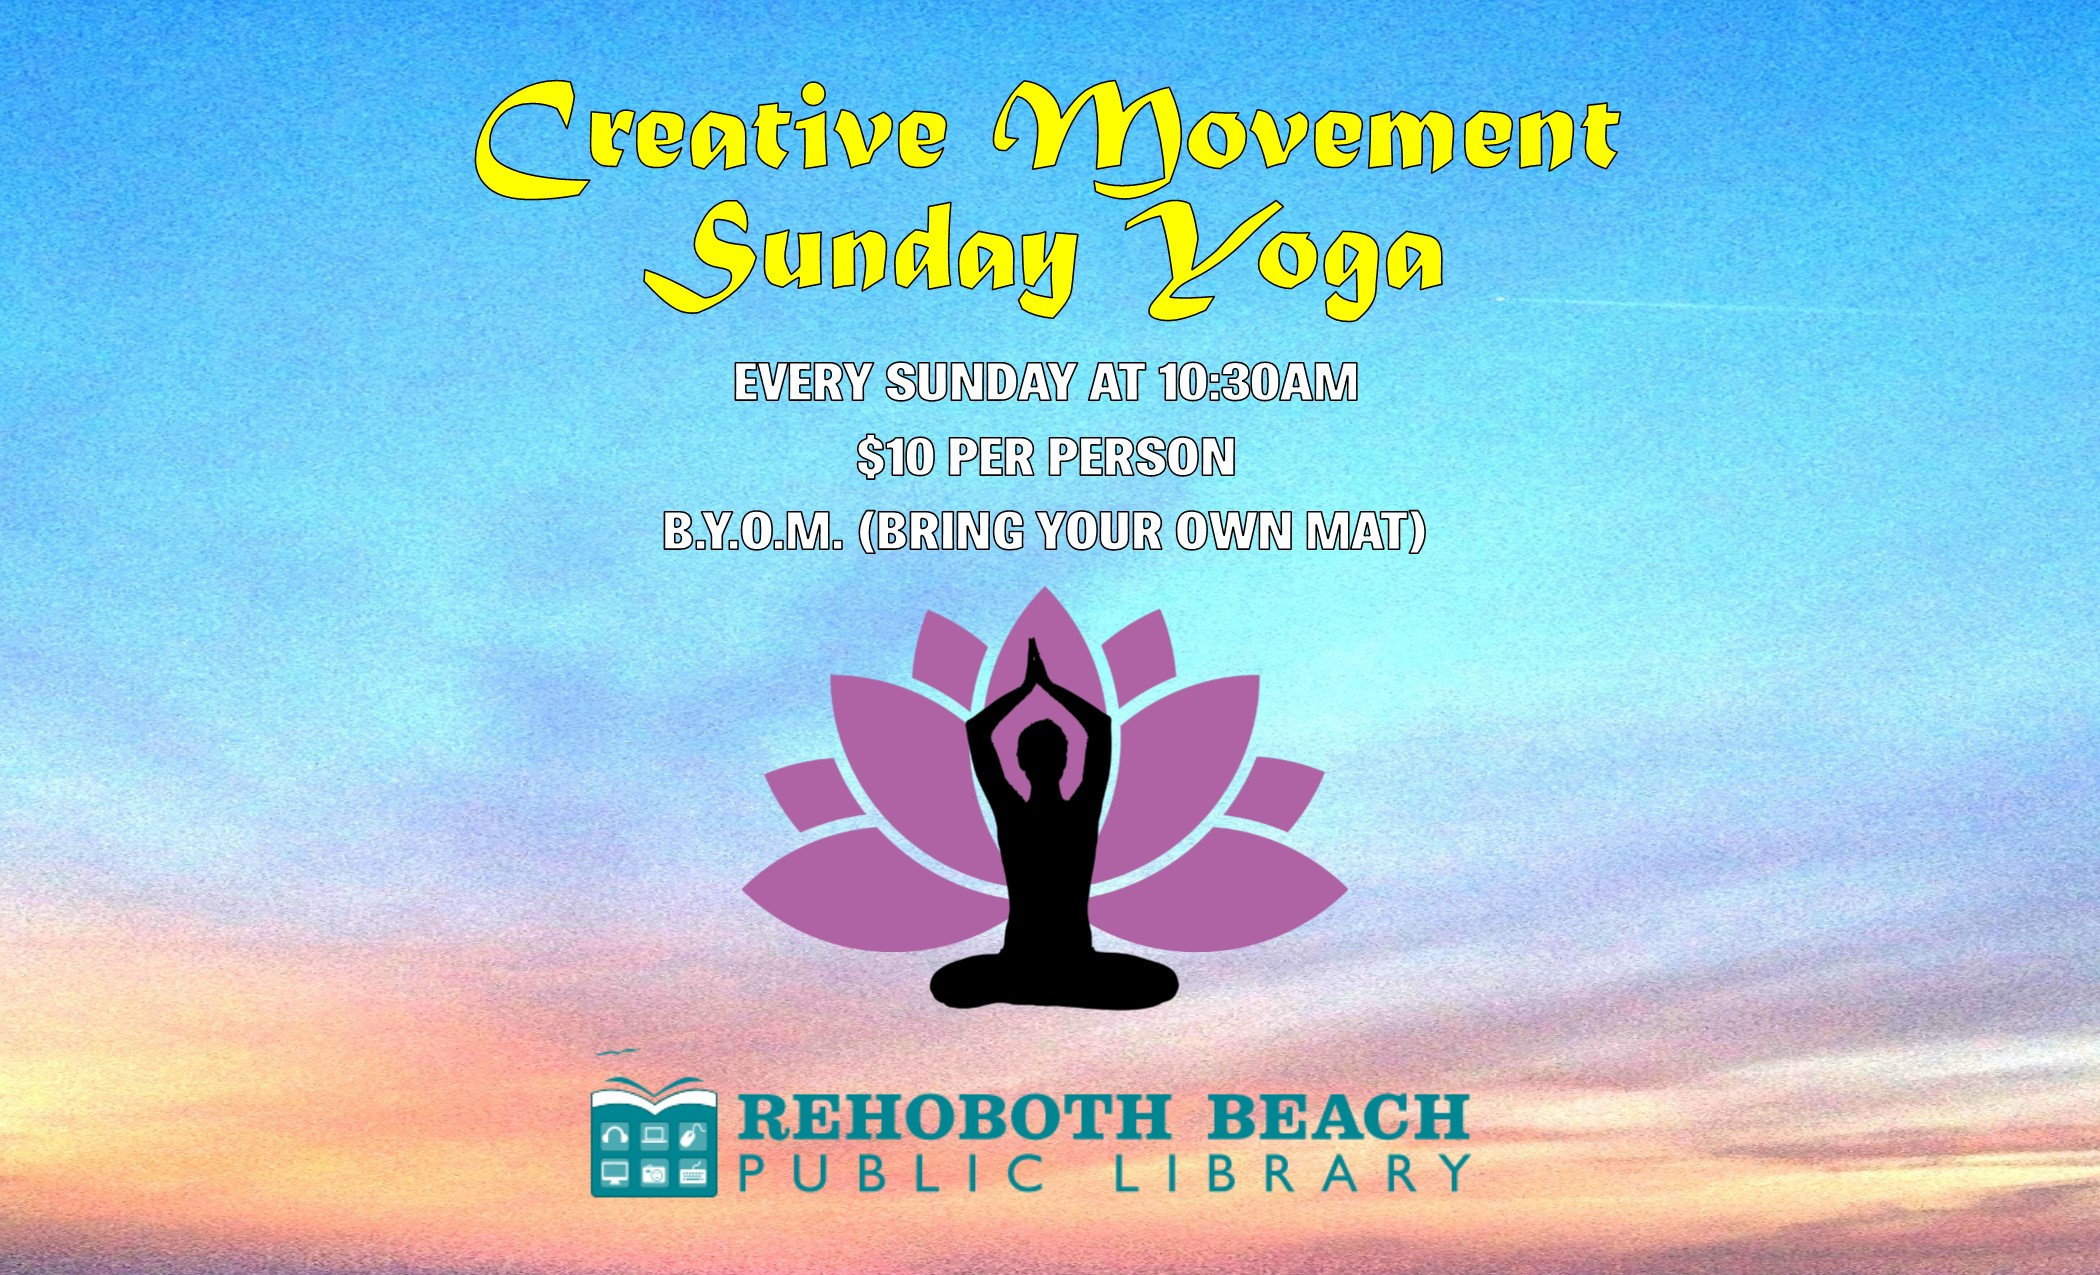 Creative Movement Sunday Yoga